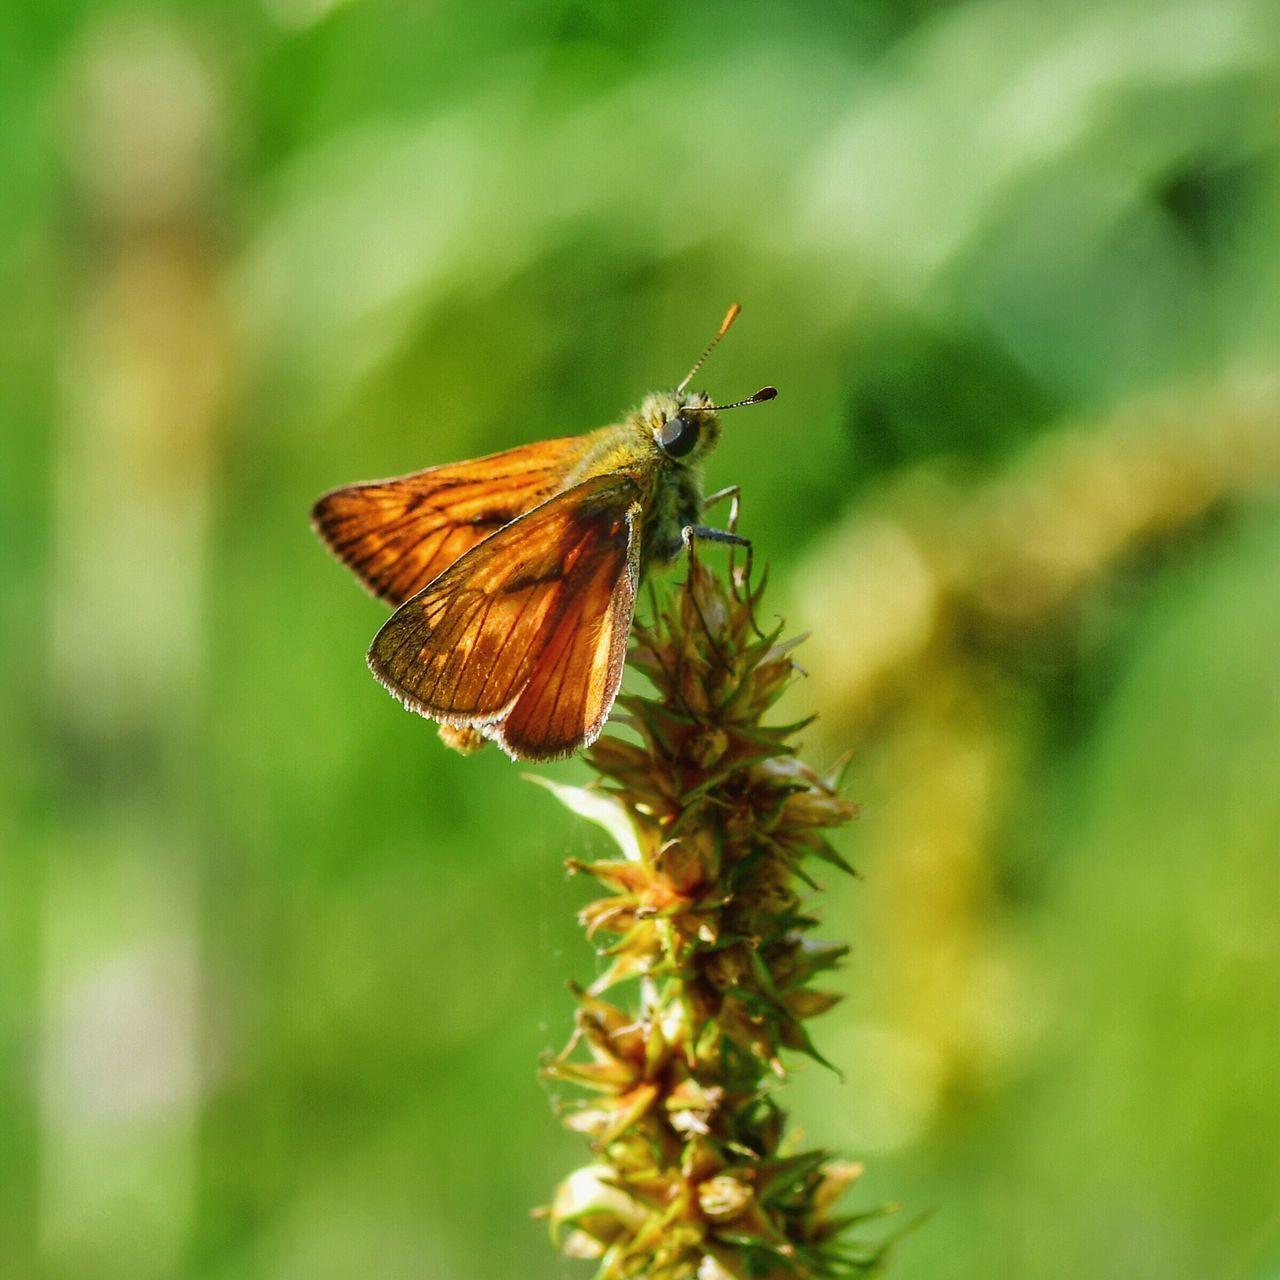 #macro #flowers #macrophotography #sigma #sigma105mm #firenze #travel #nikond500 #nikon #nital #mantis #nikonofficial #special-shot #ig-worldclub #nikonitalia #ig_italiy #igers #mynikonlife #eartpix #1x5 #nikongear #natgeotravelpic #natgeo #thebest_capture #macro_spotlight #igbest_shotz #mynikonshots #parcodellapiana #nikonromania #f64